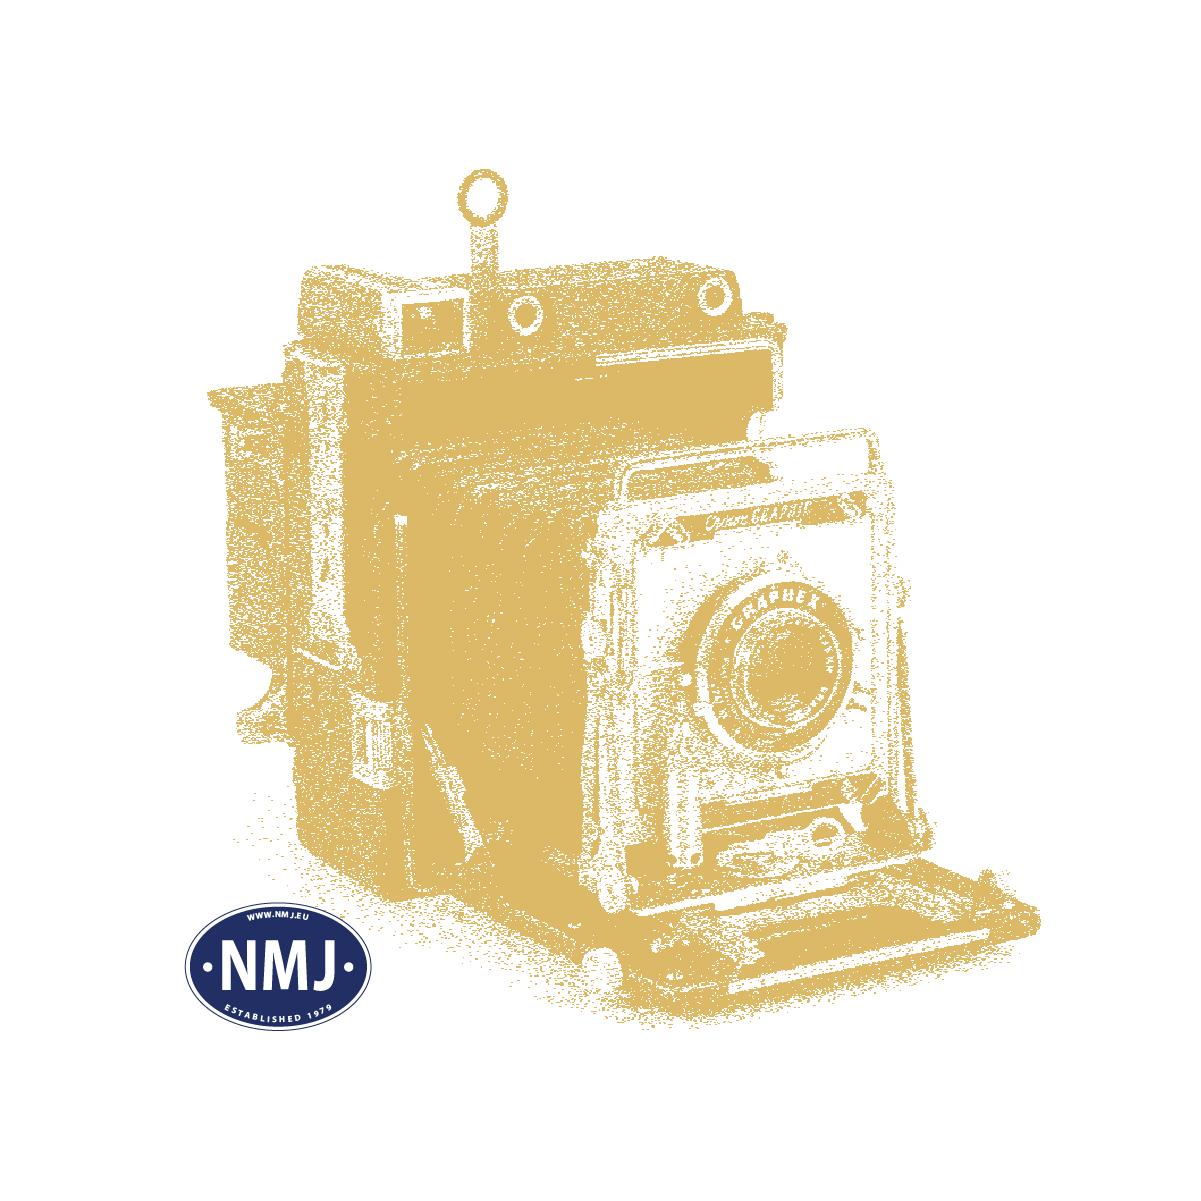 NMJT145004 - NMJ Topline NSB Di3.643, Mellomdesign, DC Analog, 0-Skala